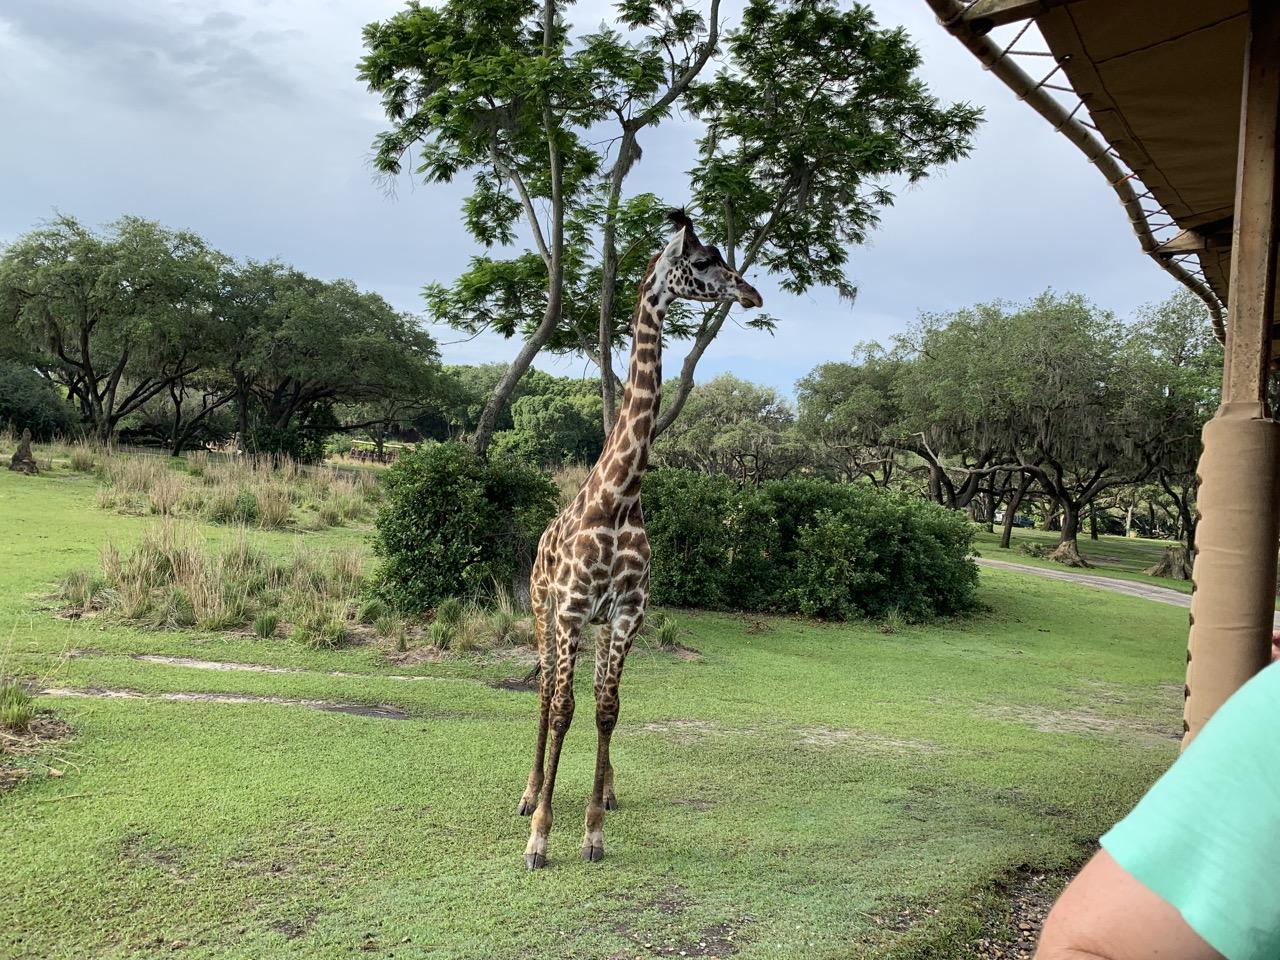 disney world trip report early summer 2019 day three 37 safari.jpeg